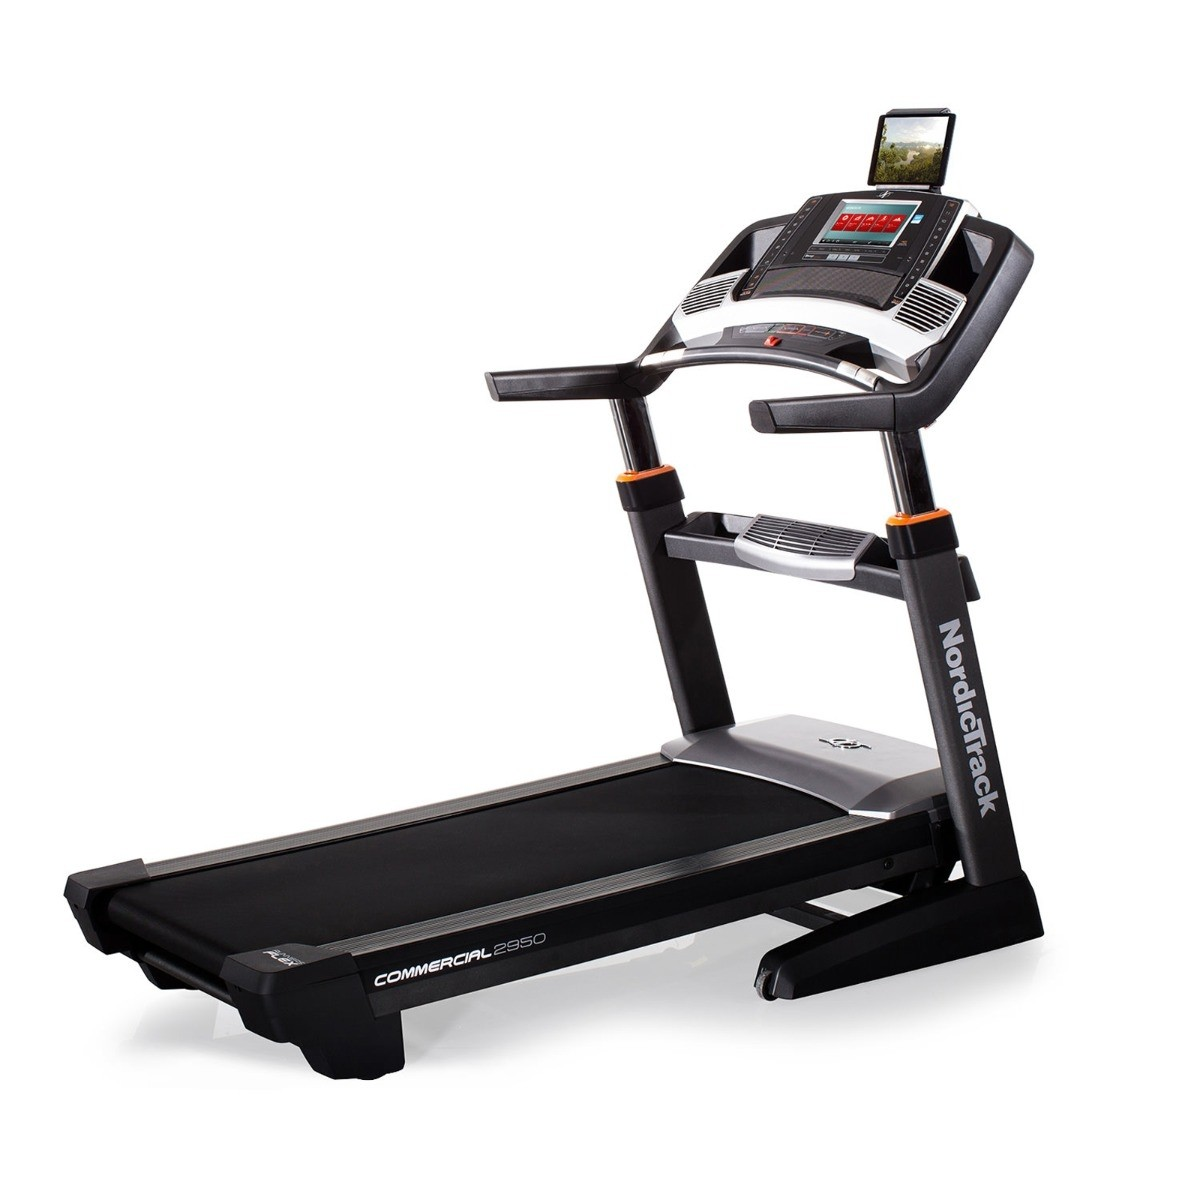 NordicTrack C 2950 Treadmill